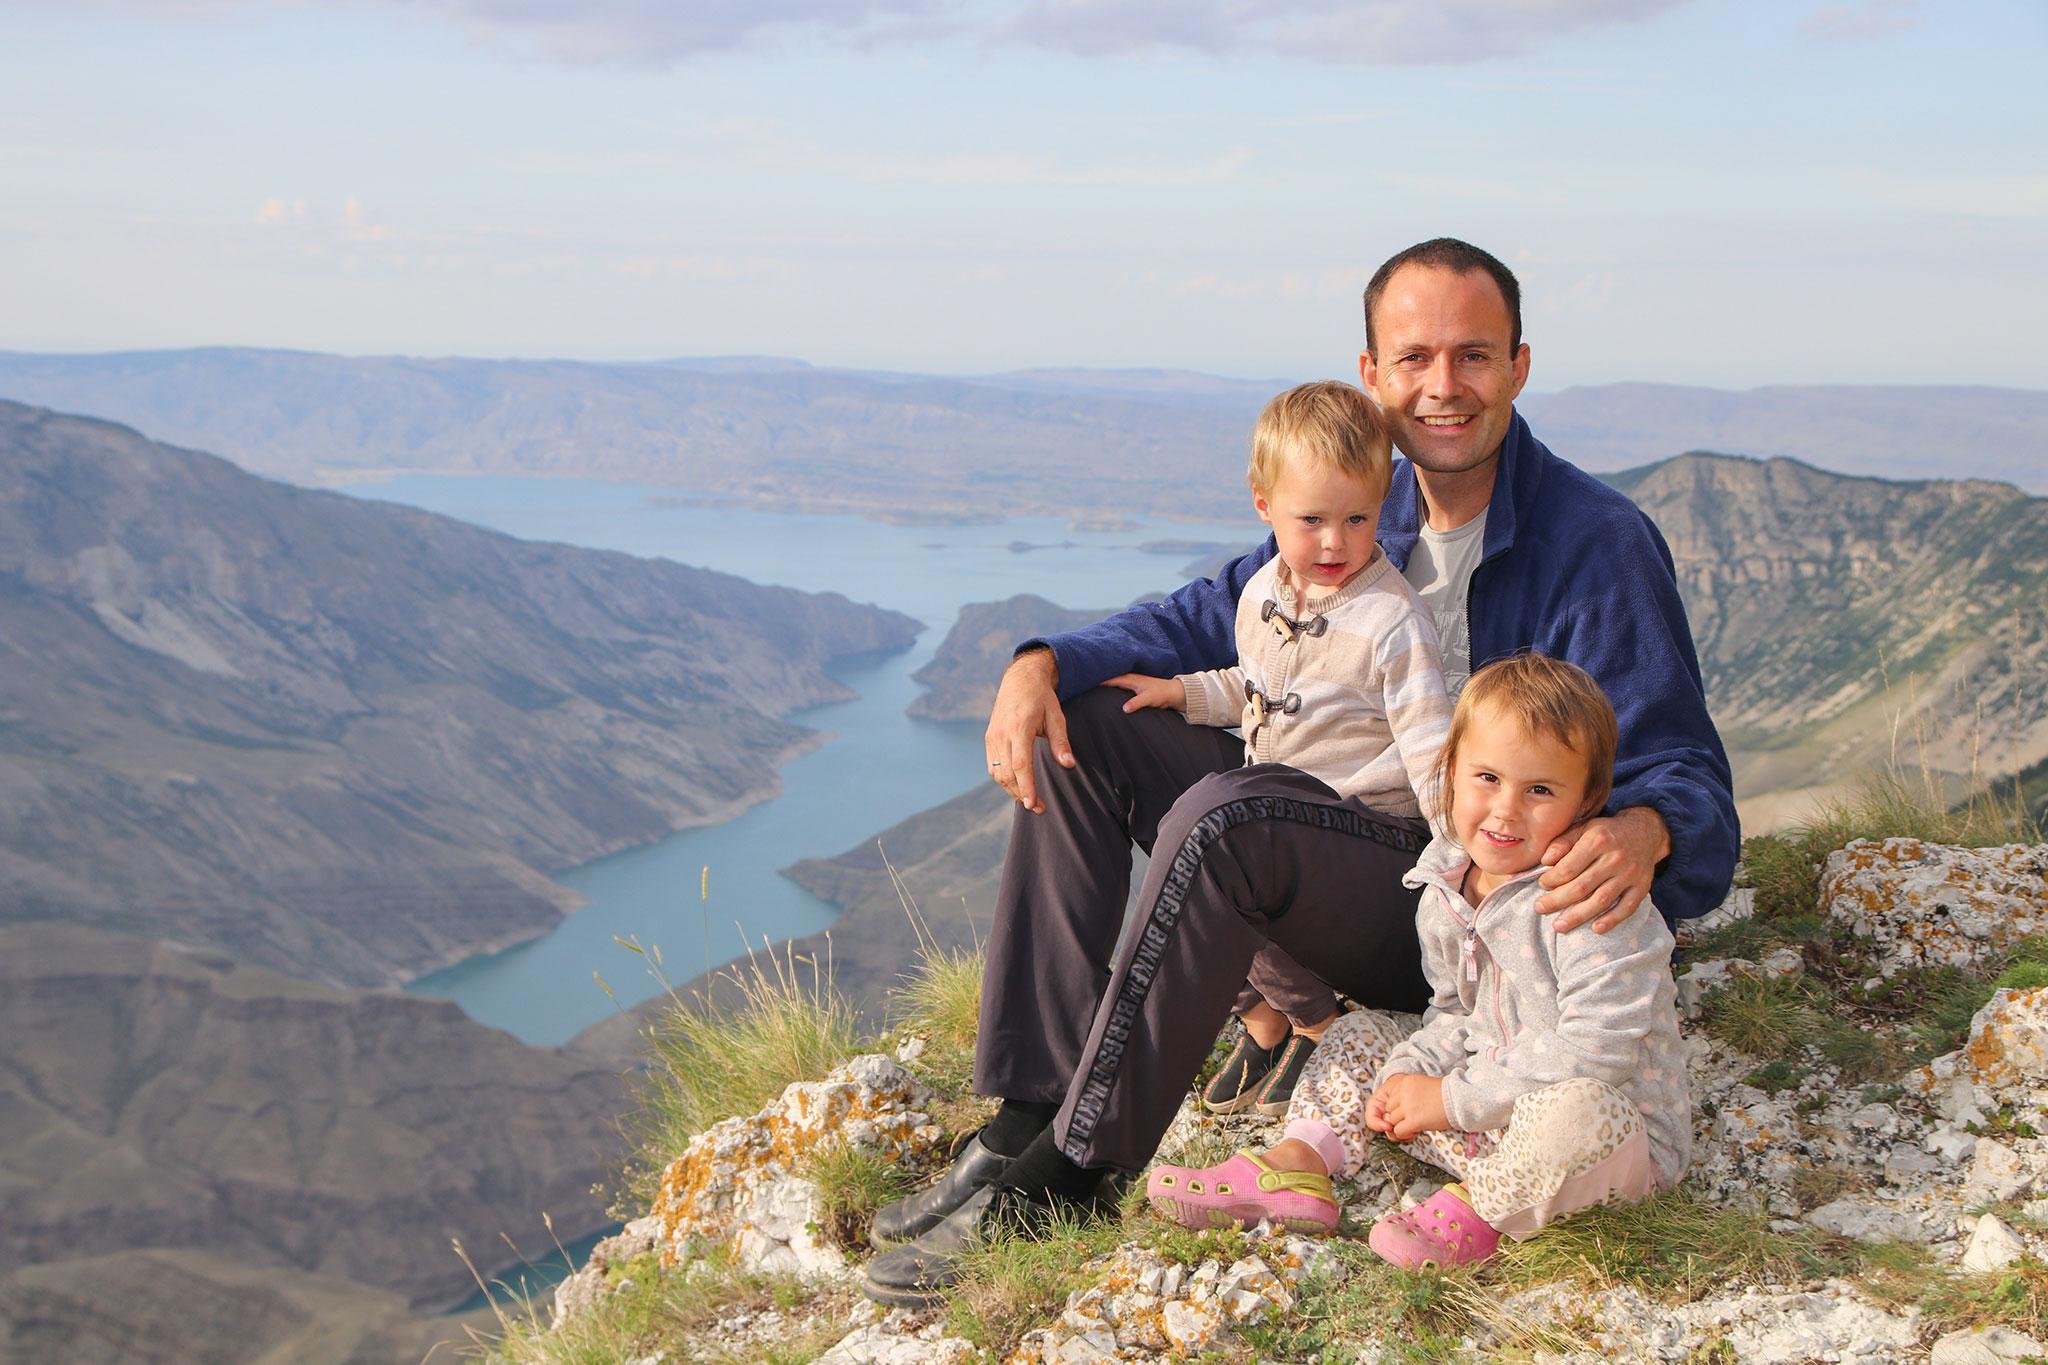 A family vacation